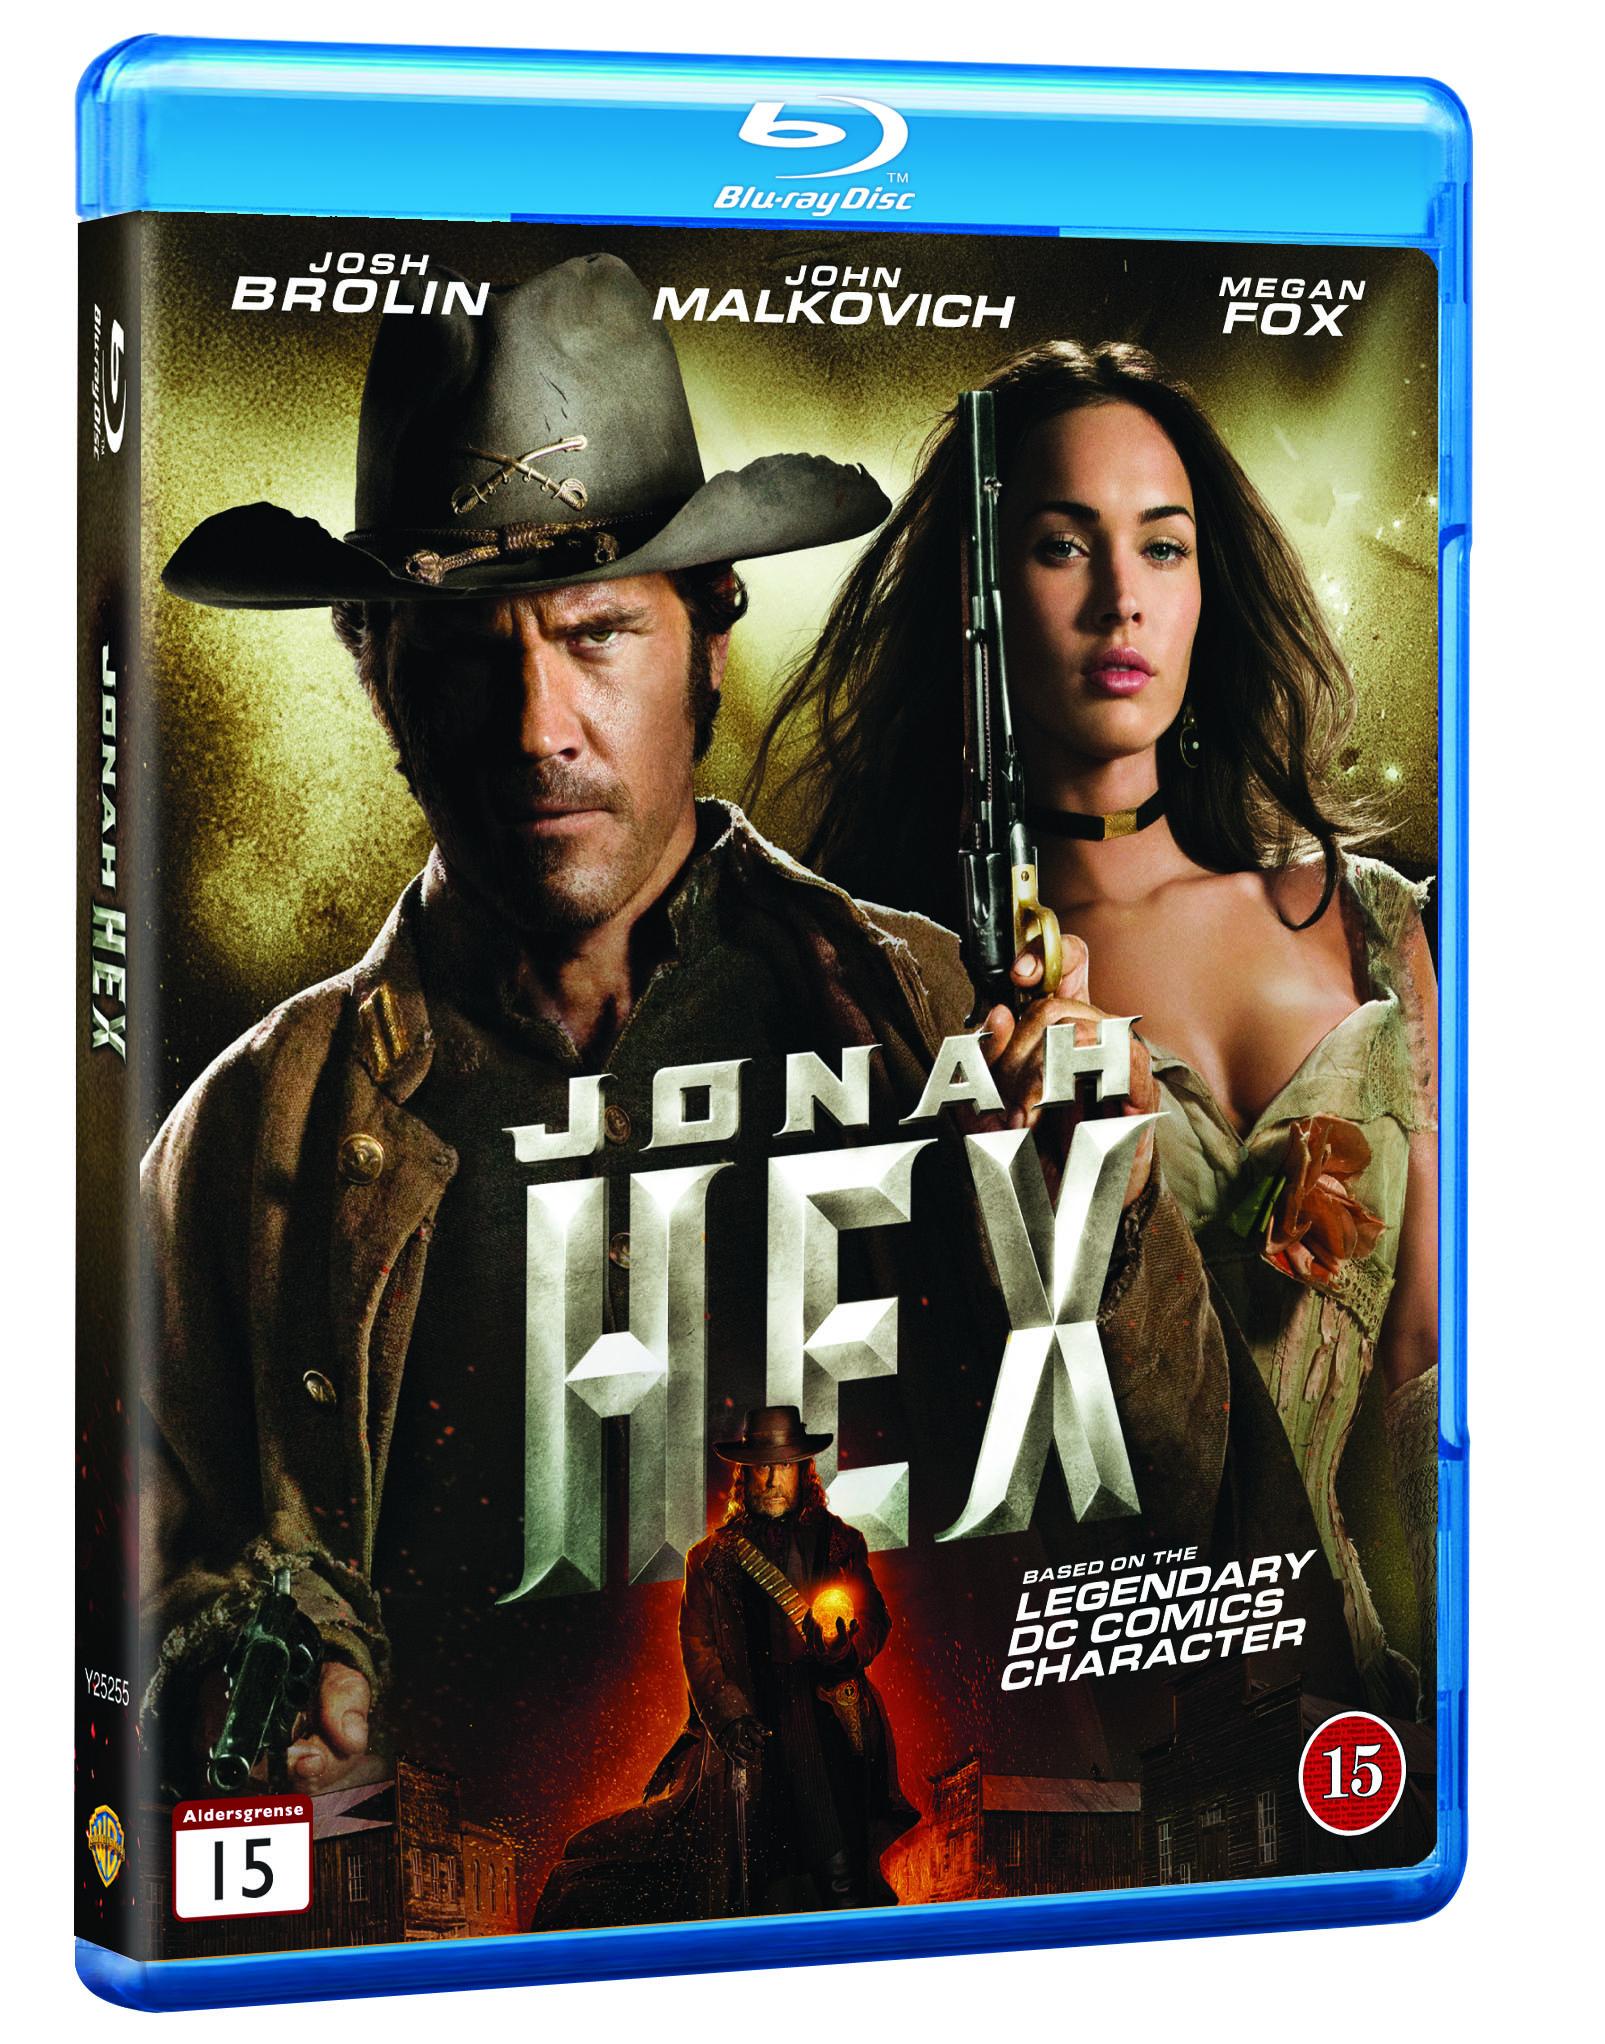 Jonah Hex - Blu Ray